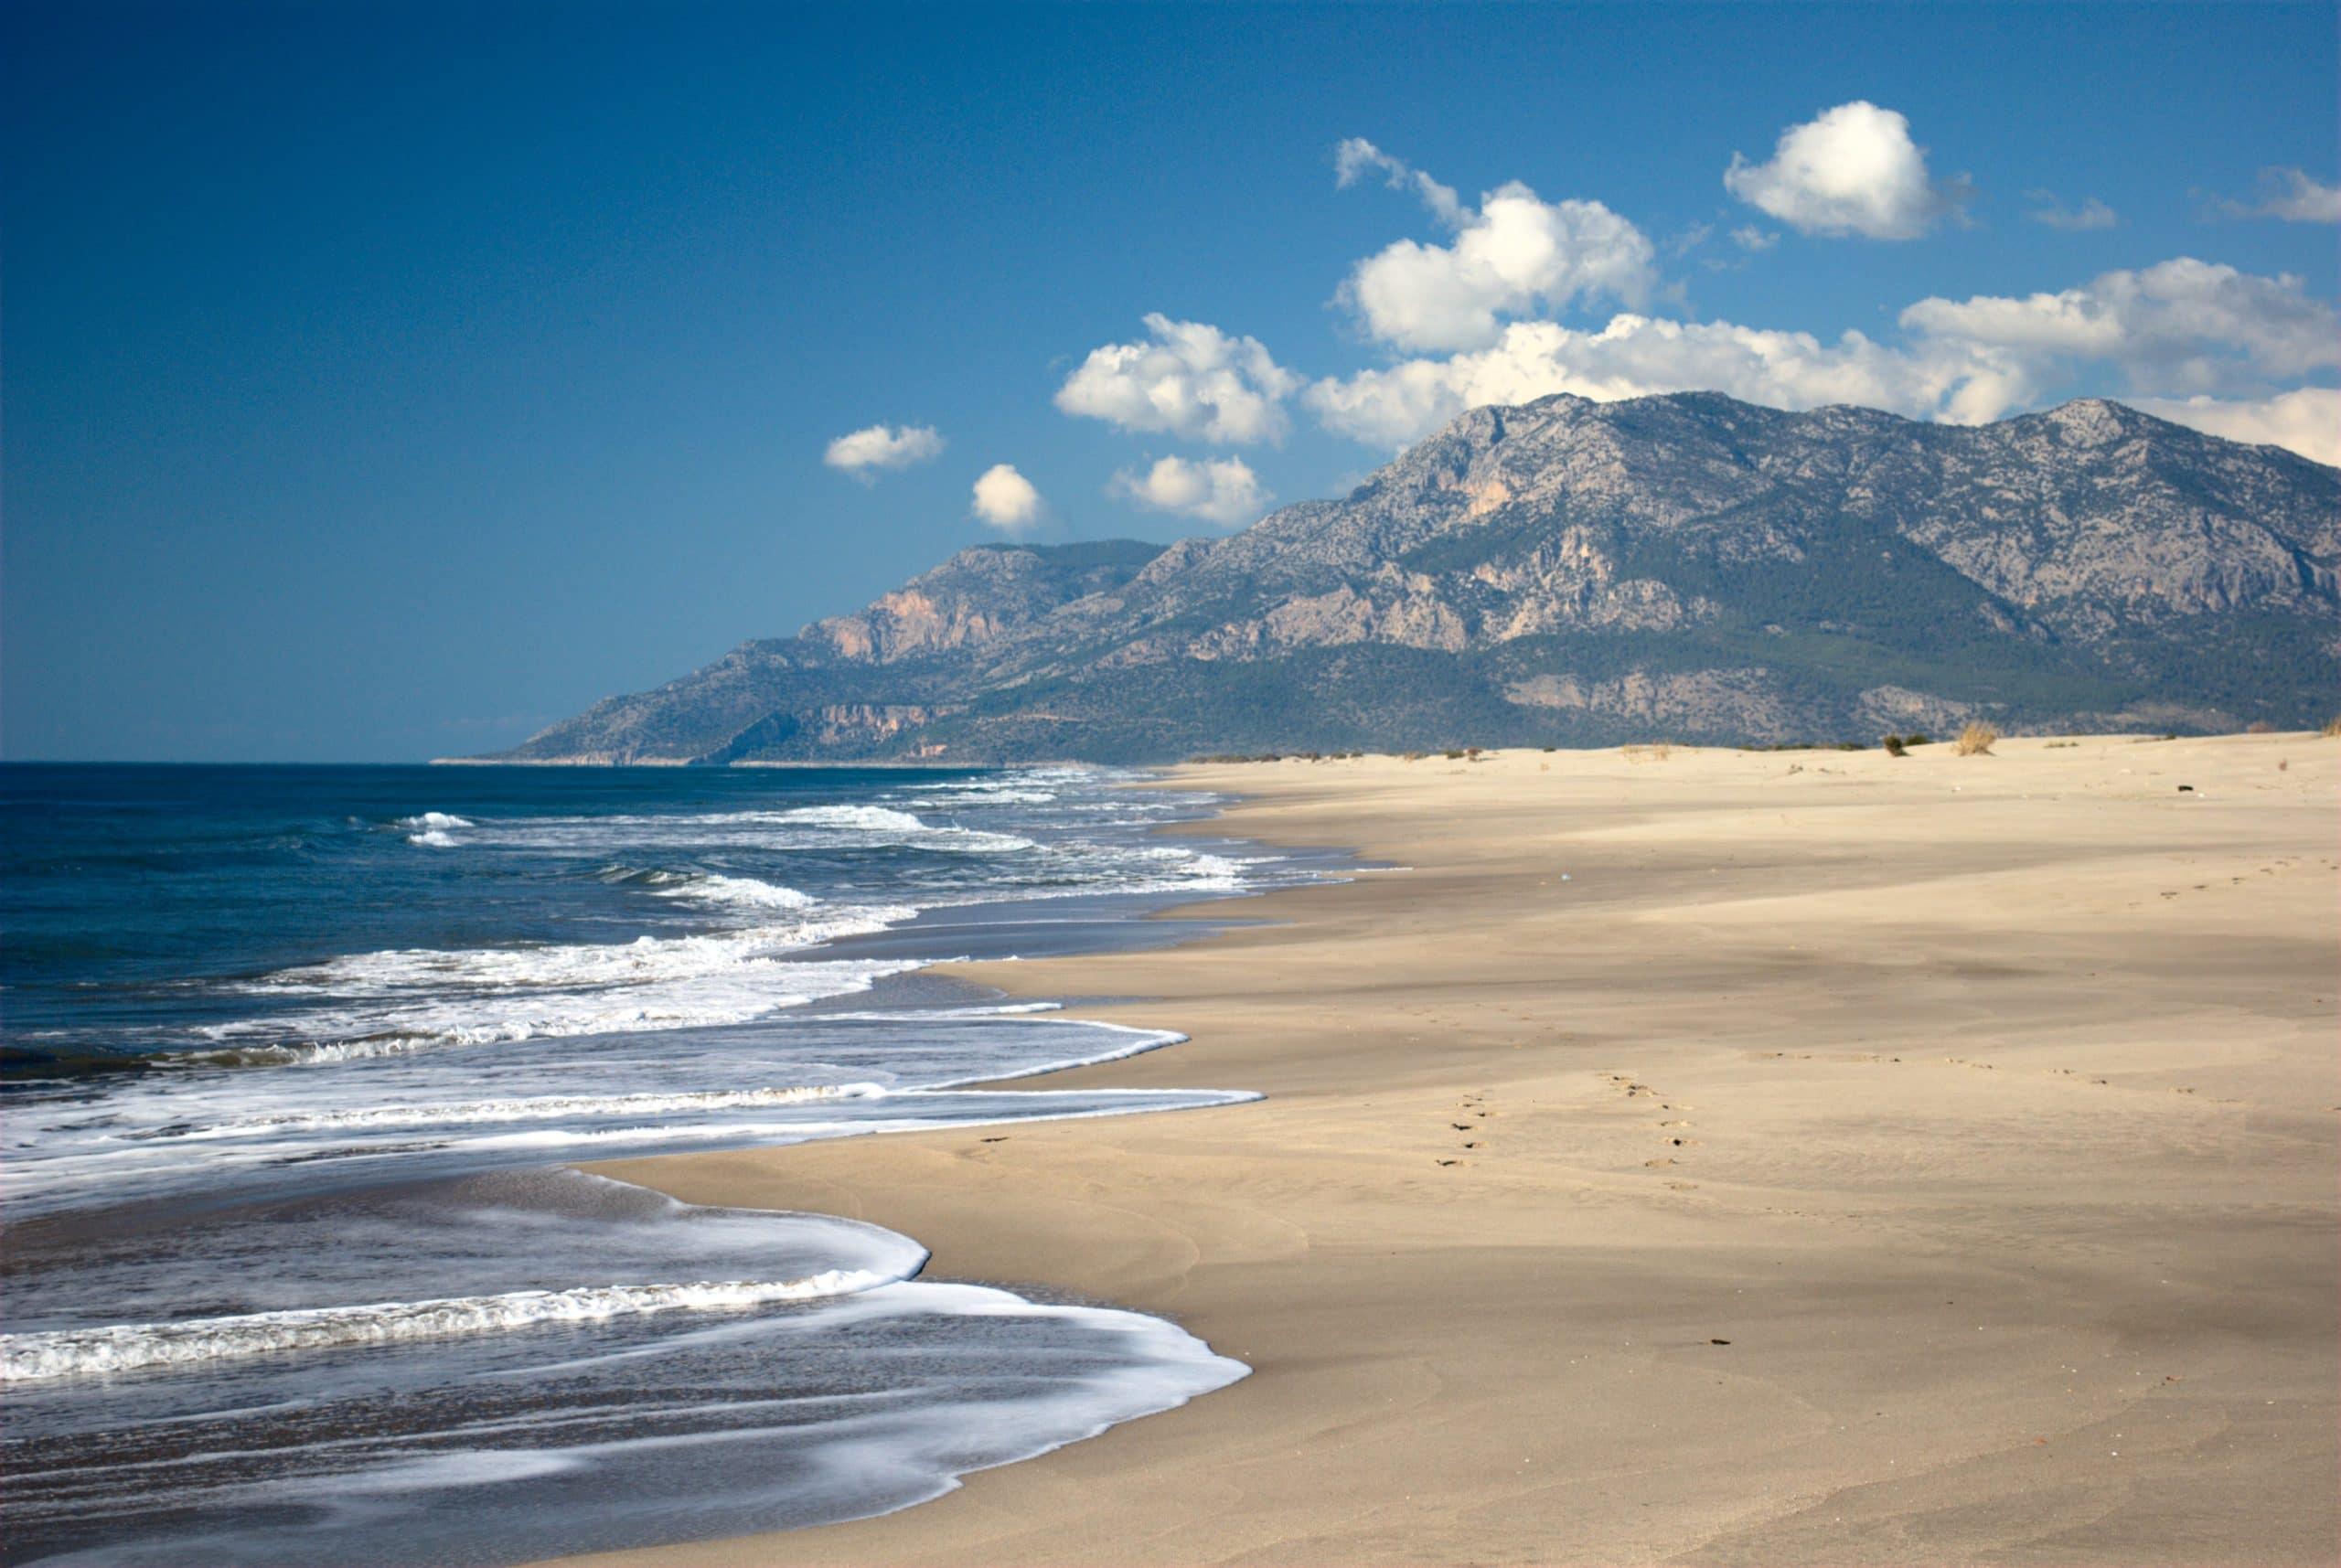 Patara Beach is Turkey's longest beach with a 12-miles (18-kilometer) impressive sand